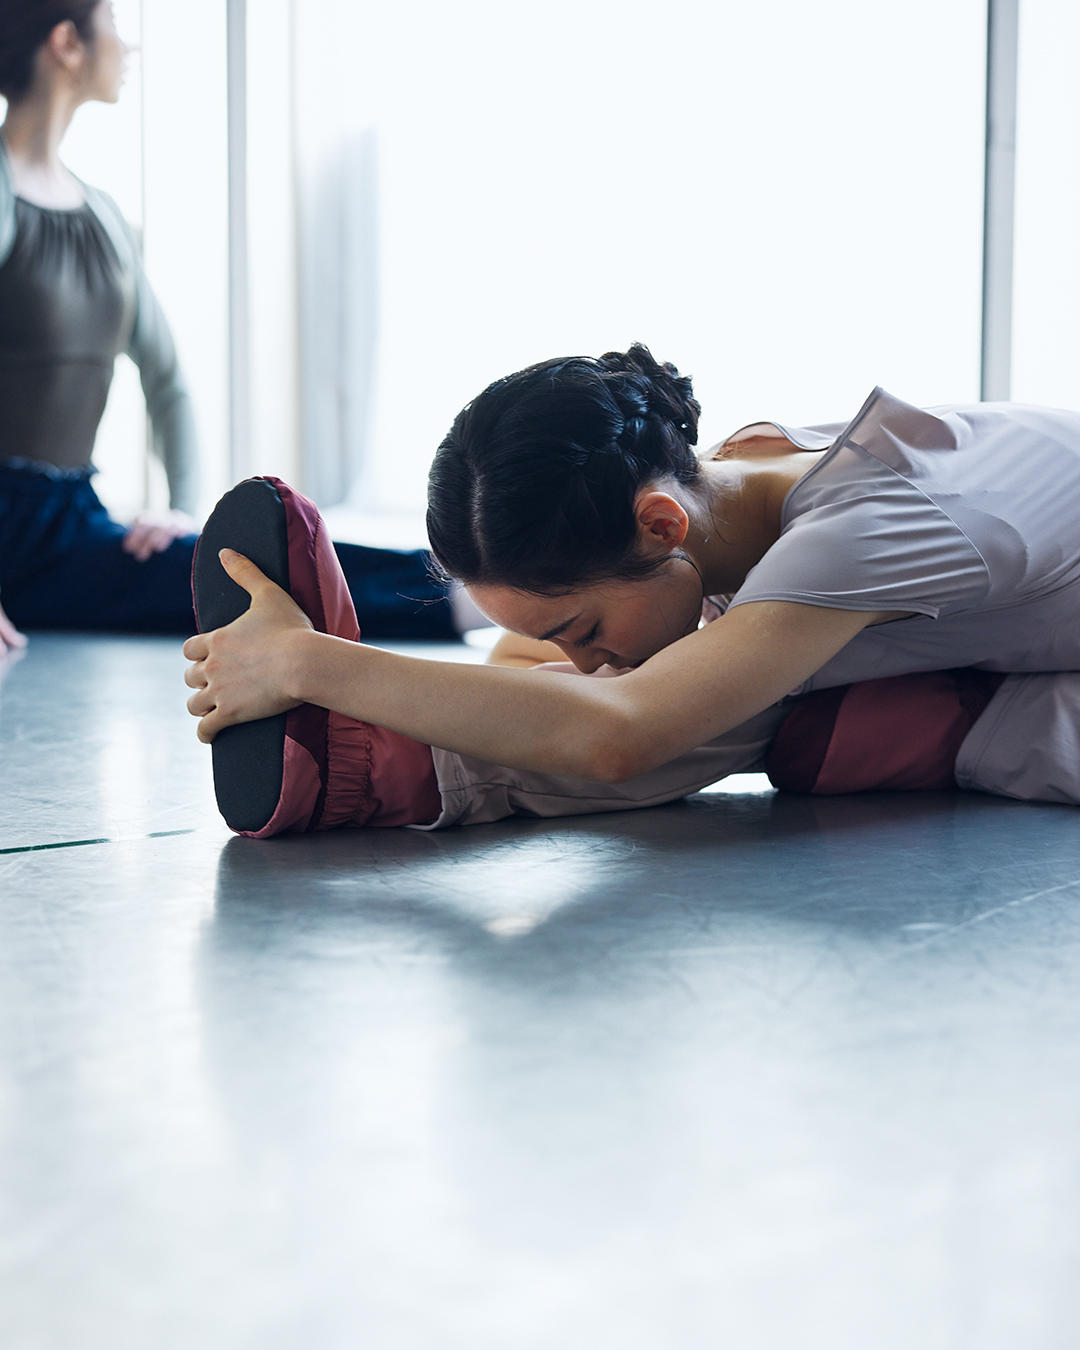 210331_ballet_warmup_1.jpg